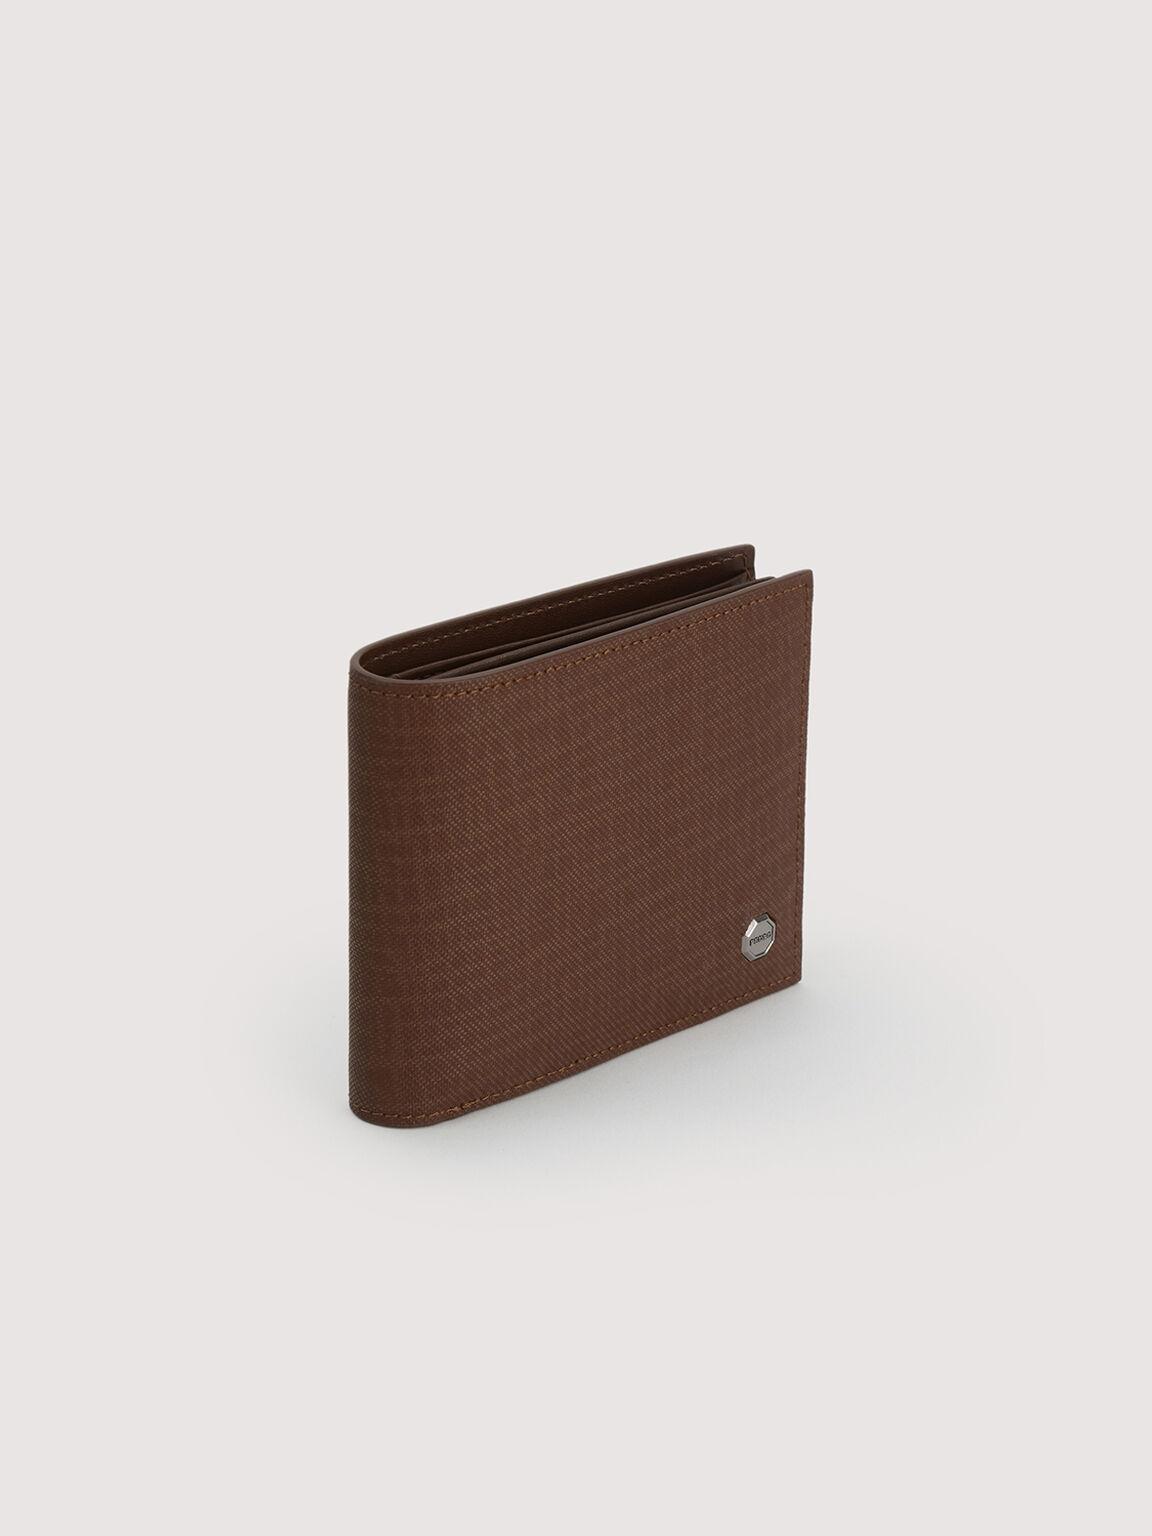 Leather Bi-Fold with Flip, Brown, hi-res